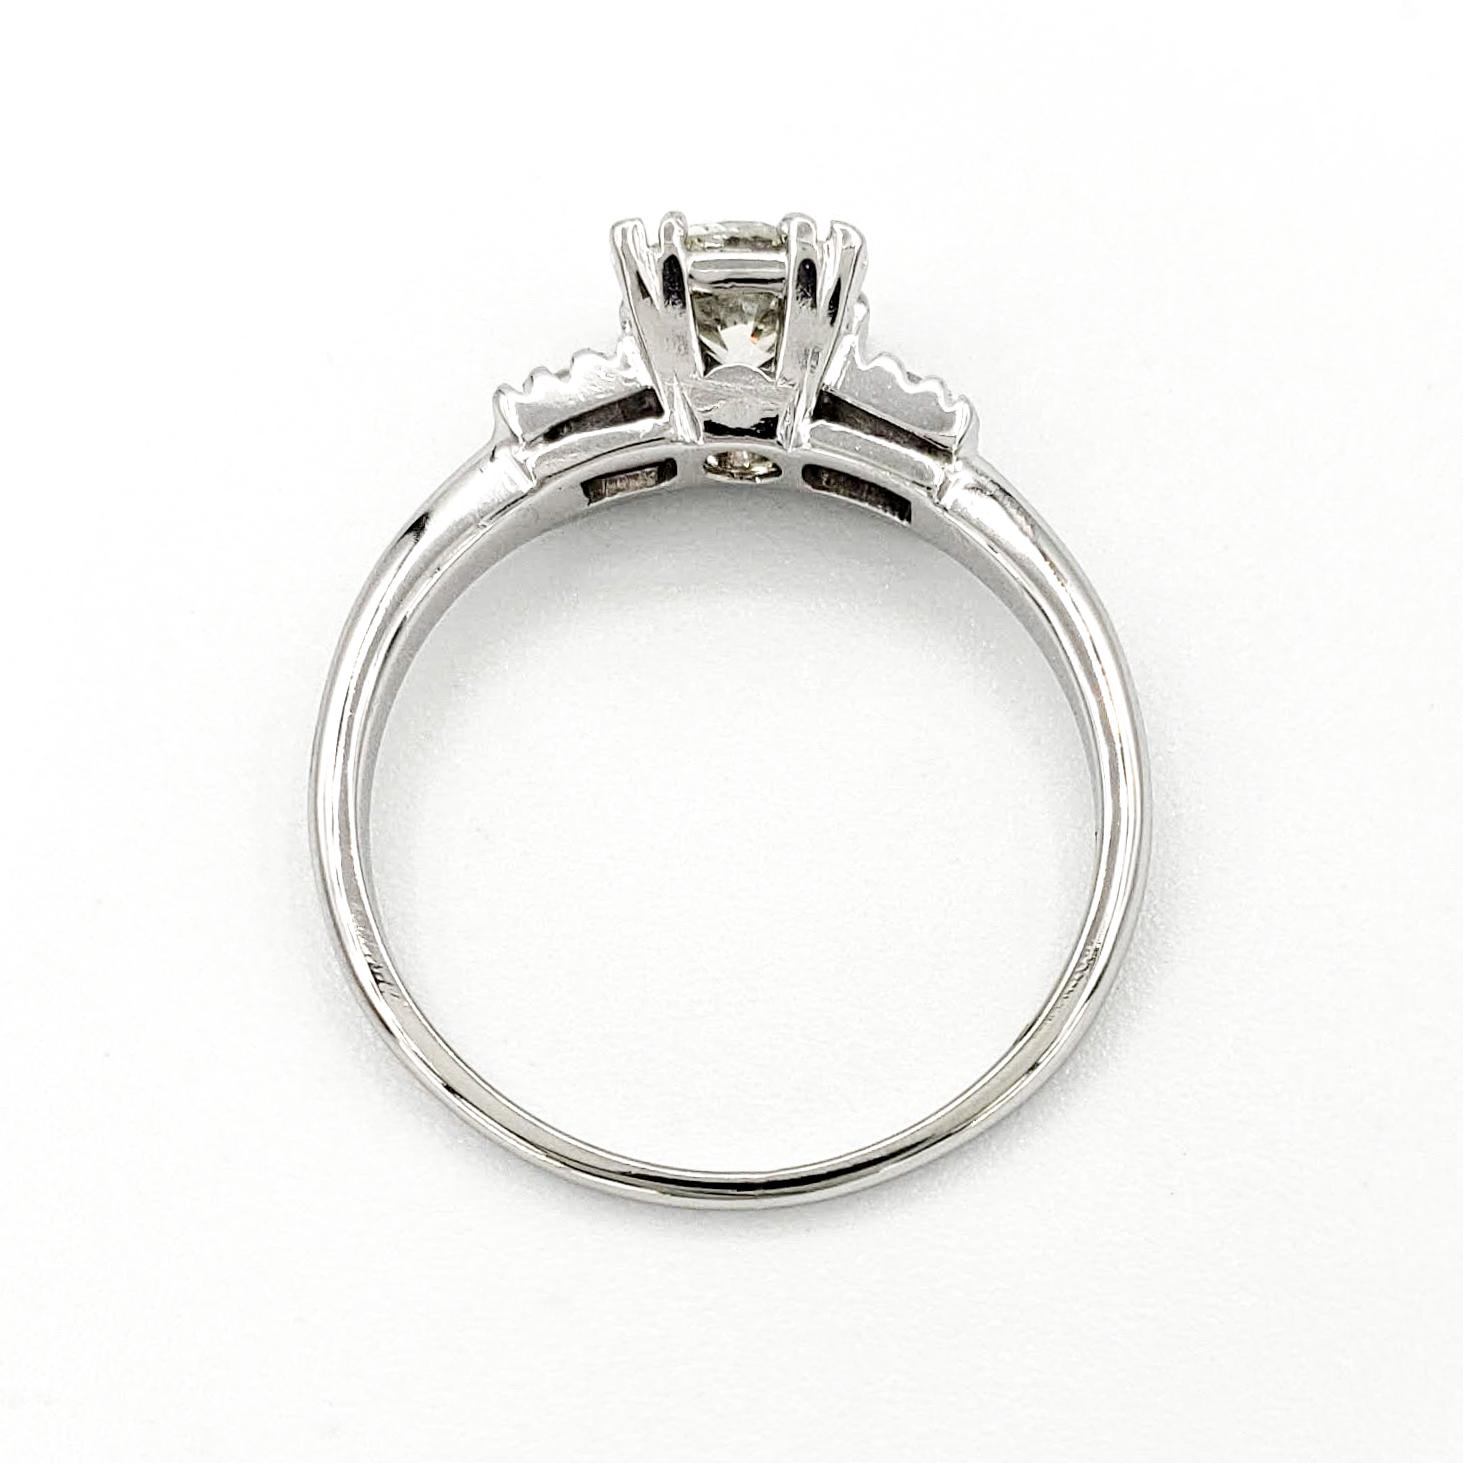 Vintage Platinum Engagement Ring With 0.48 Carat Old European Cut Diamond EGL - J VS2